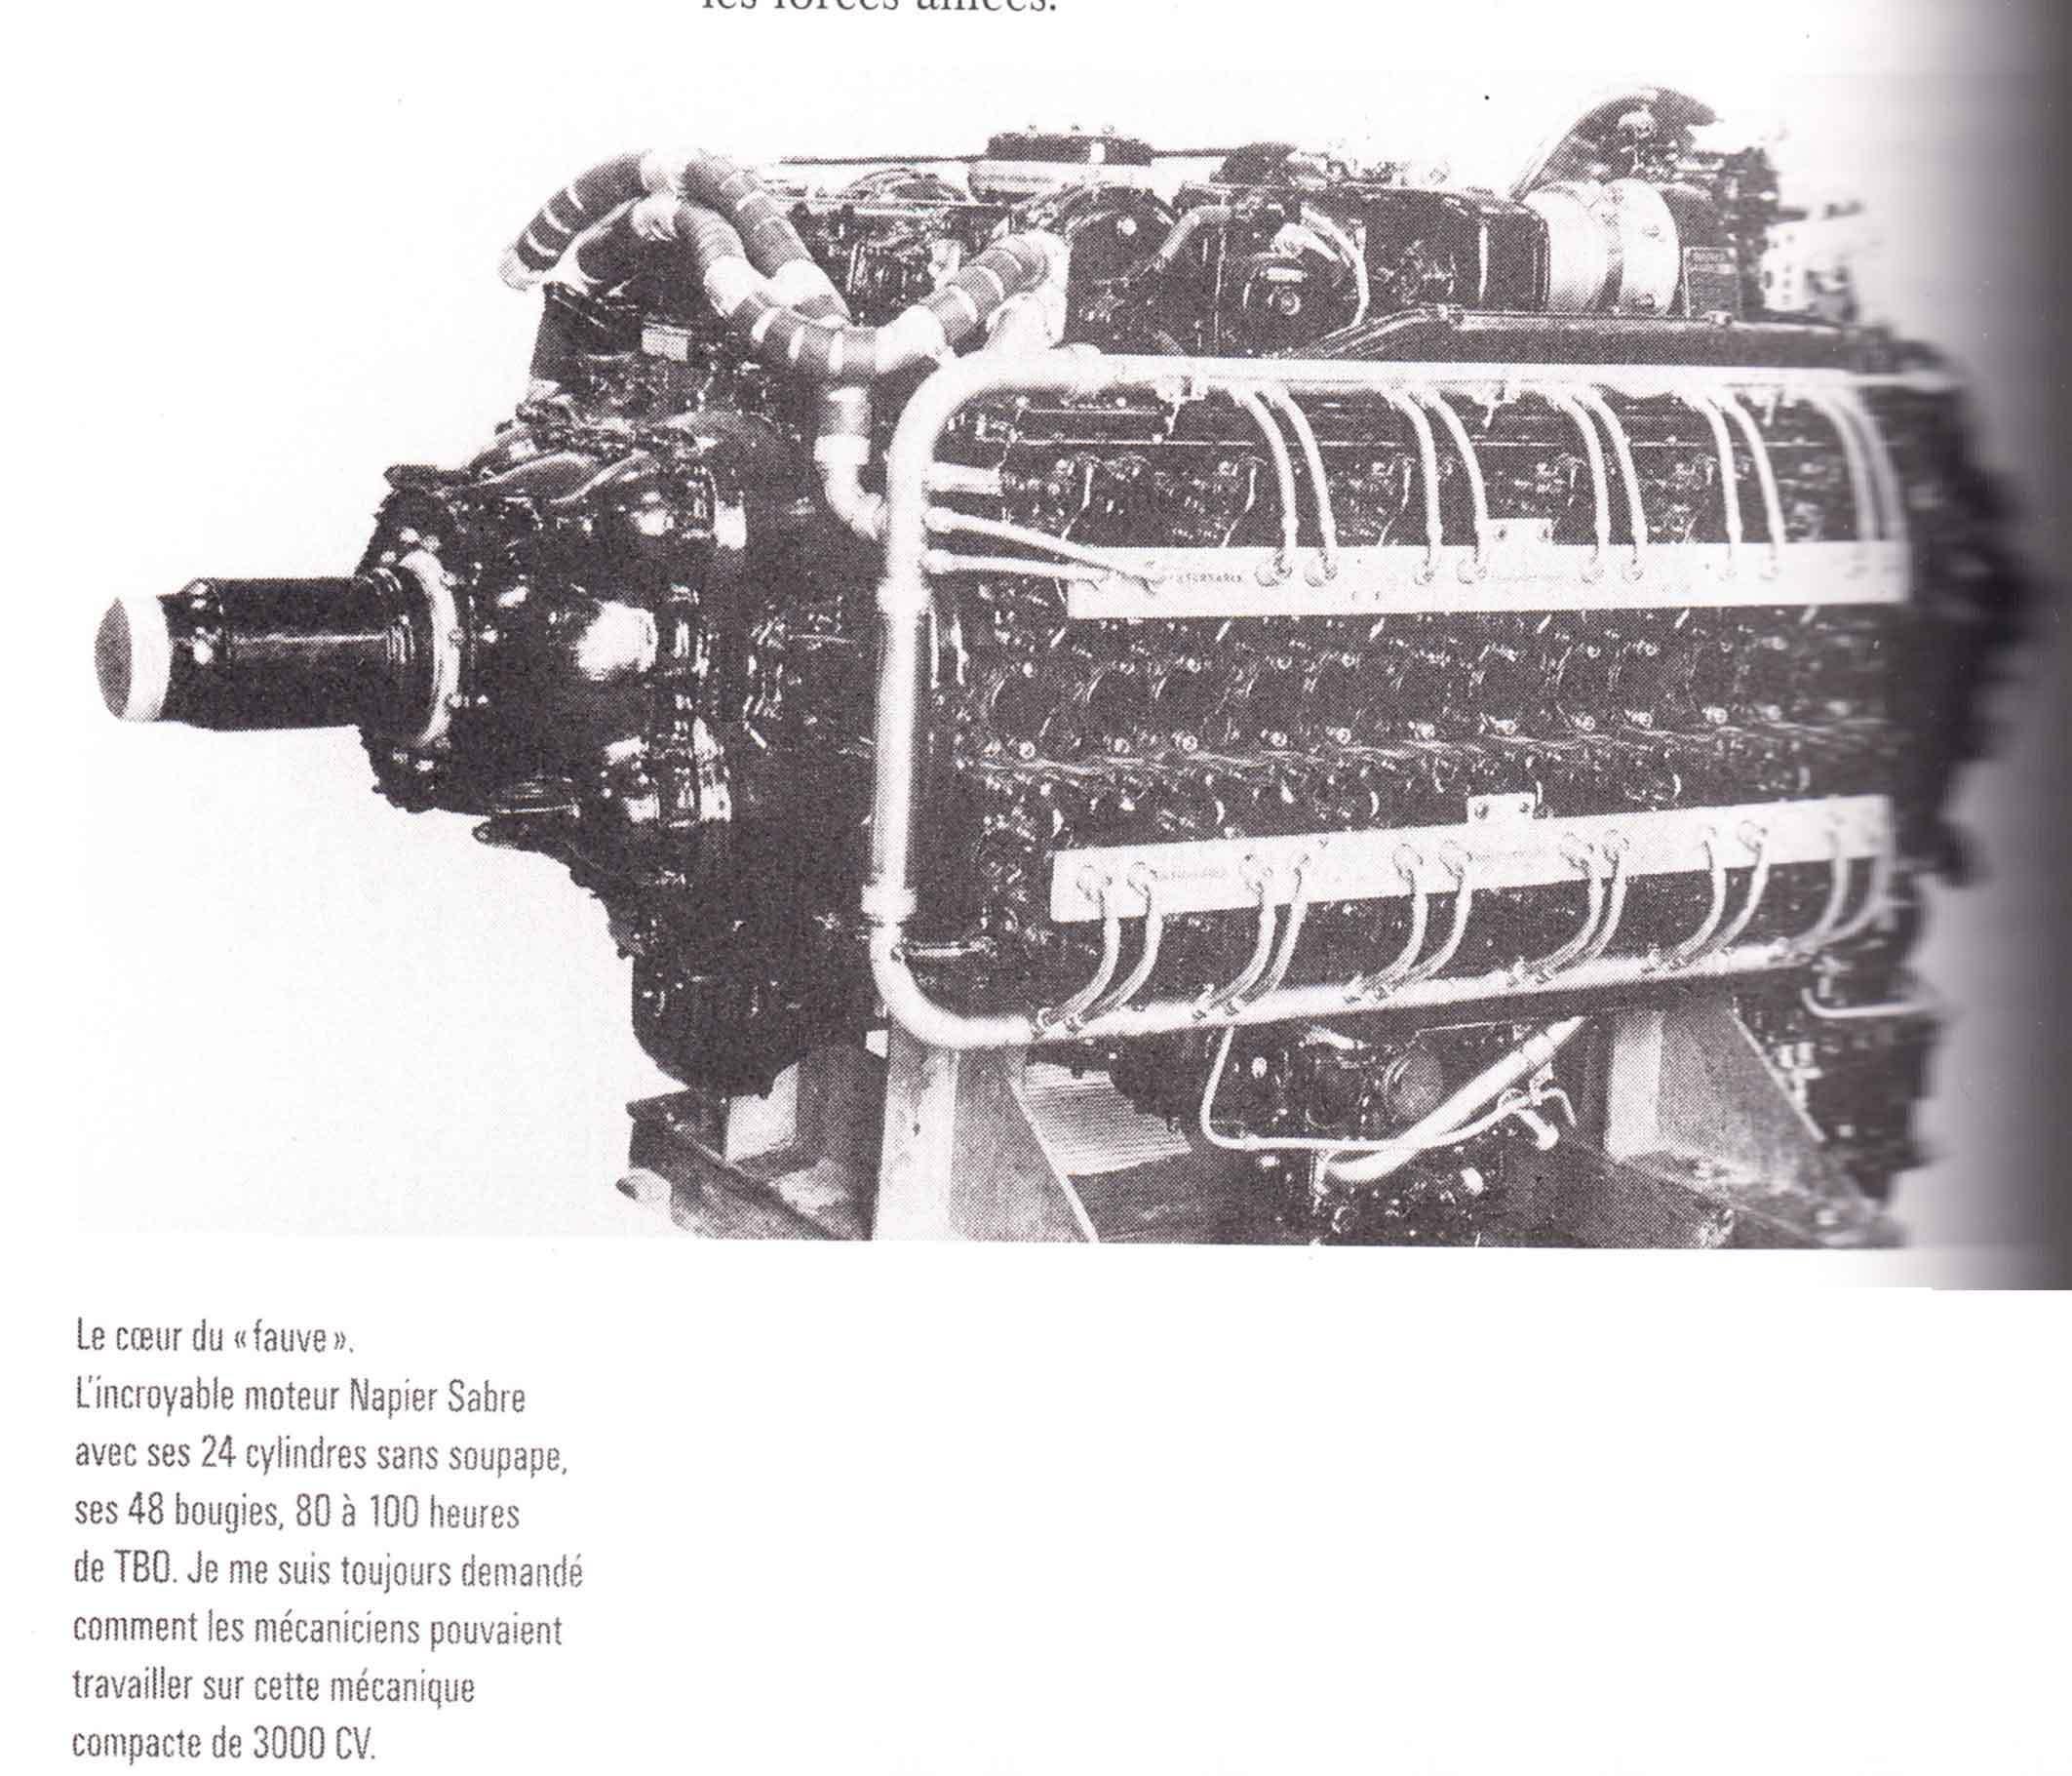 Hawker Tempest Special Hobby au 1/32ème LQs0MK